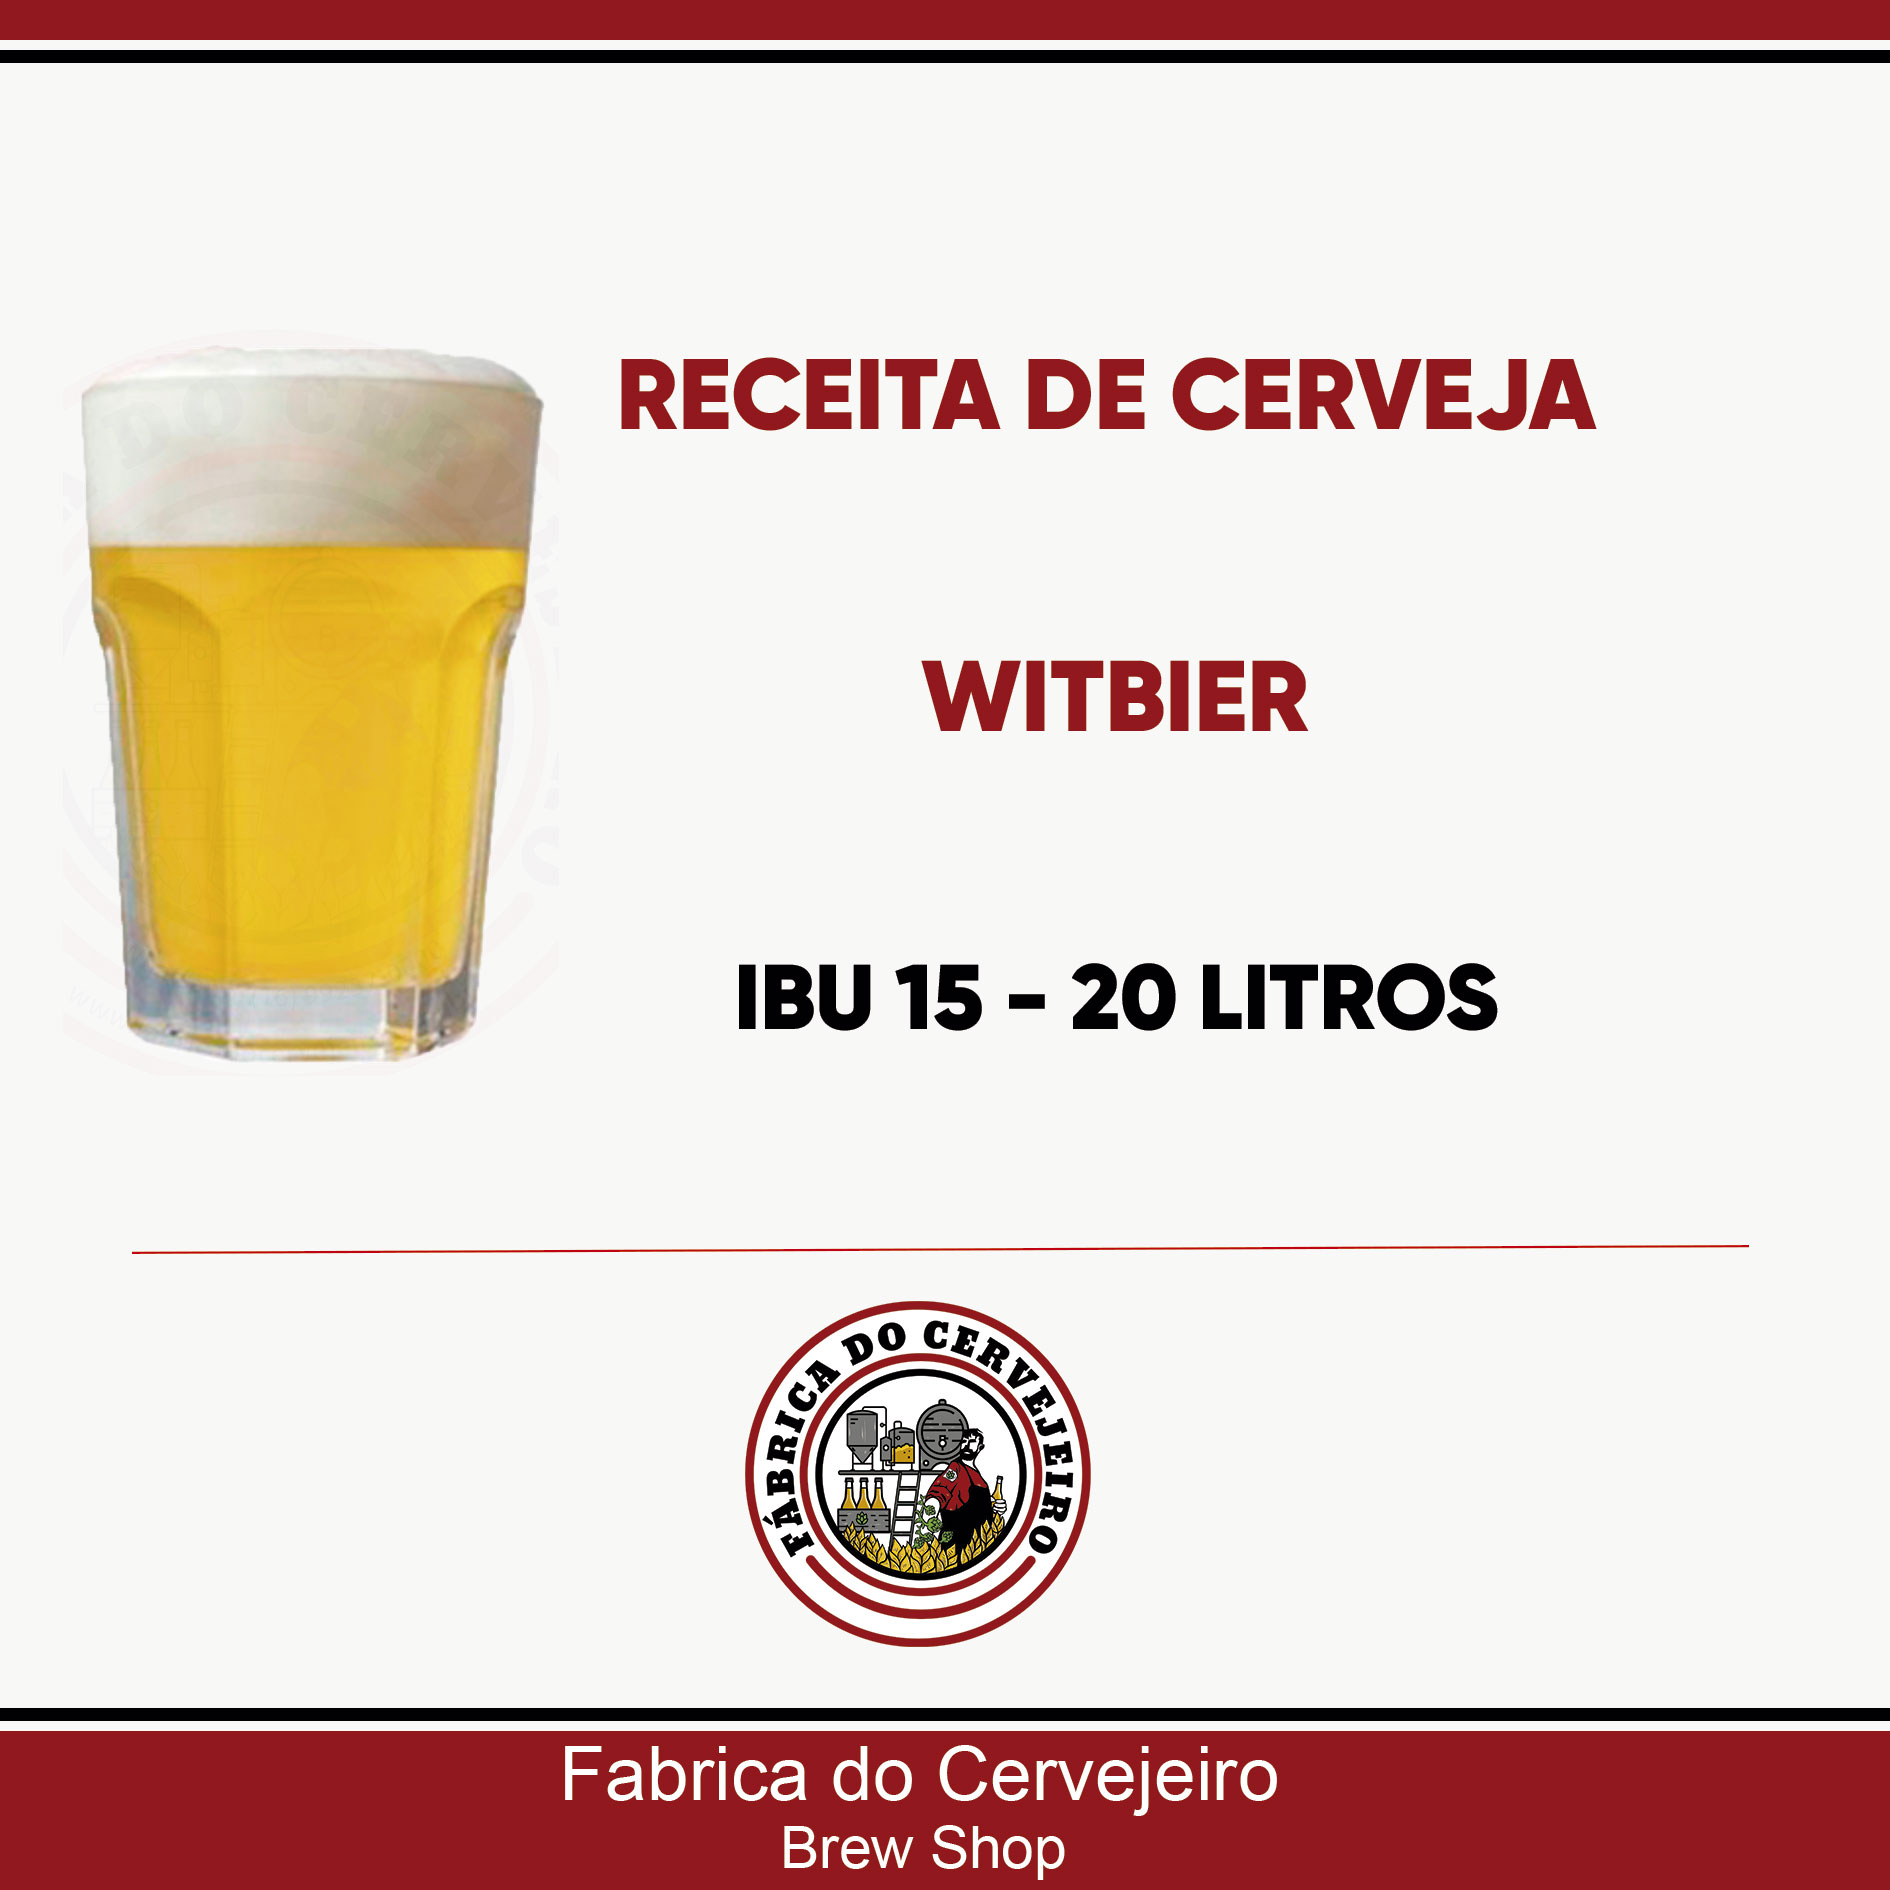 Receita de Witbier 20 Litros